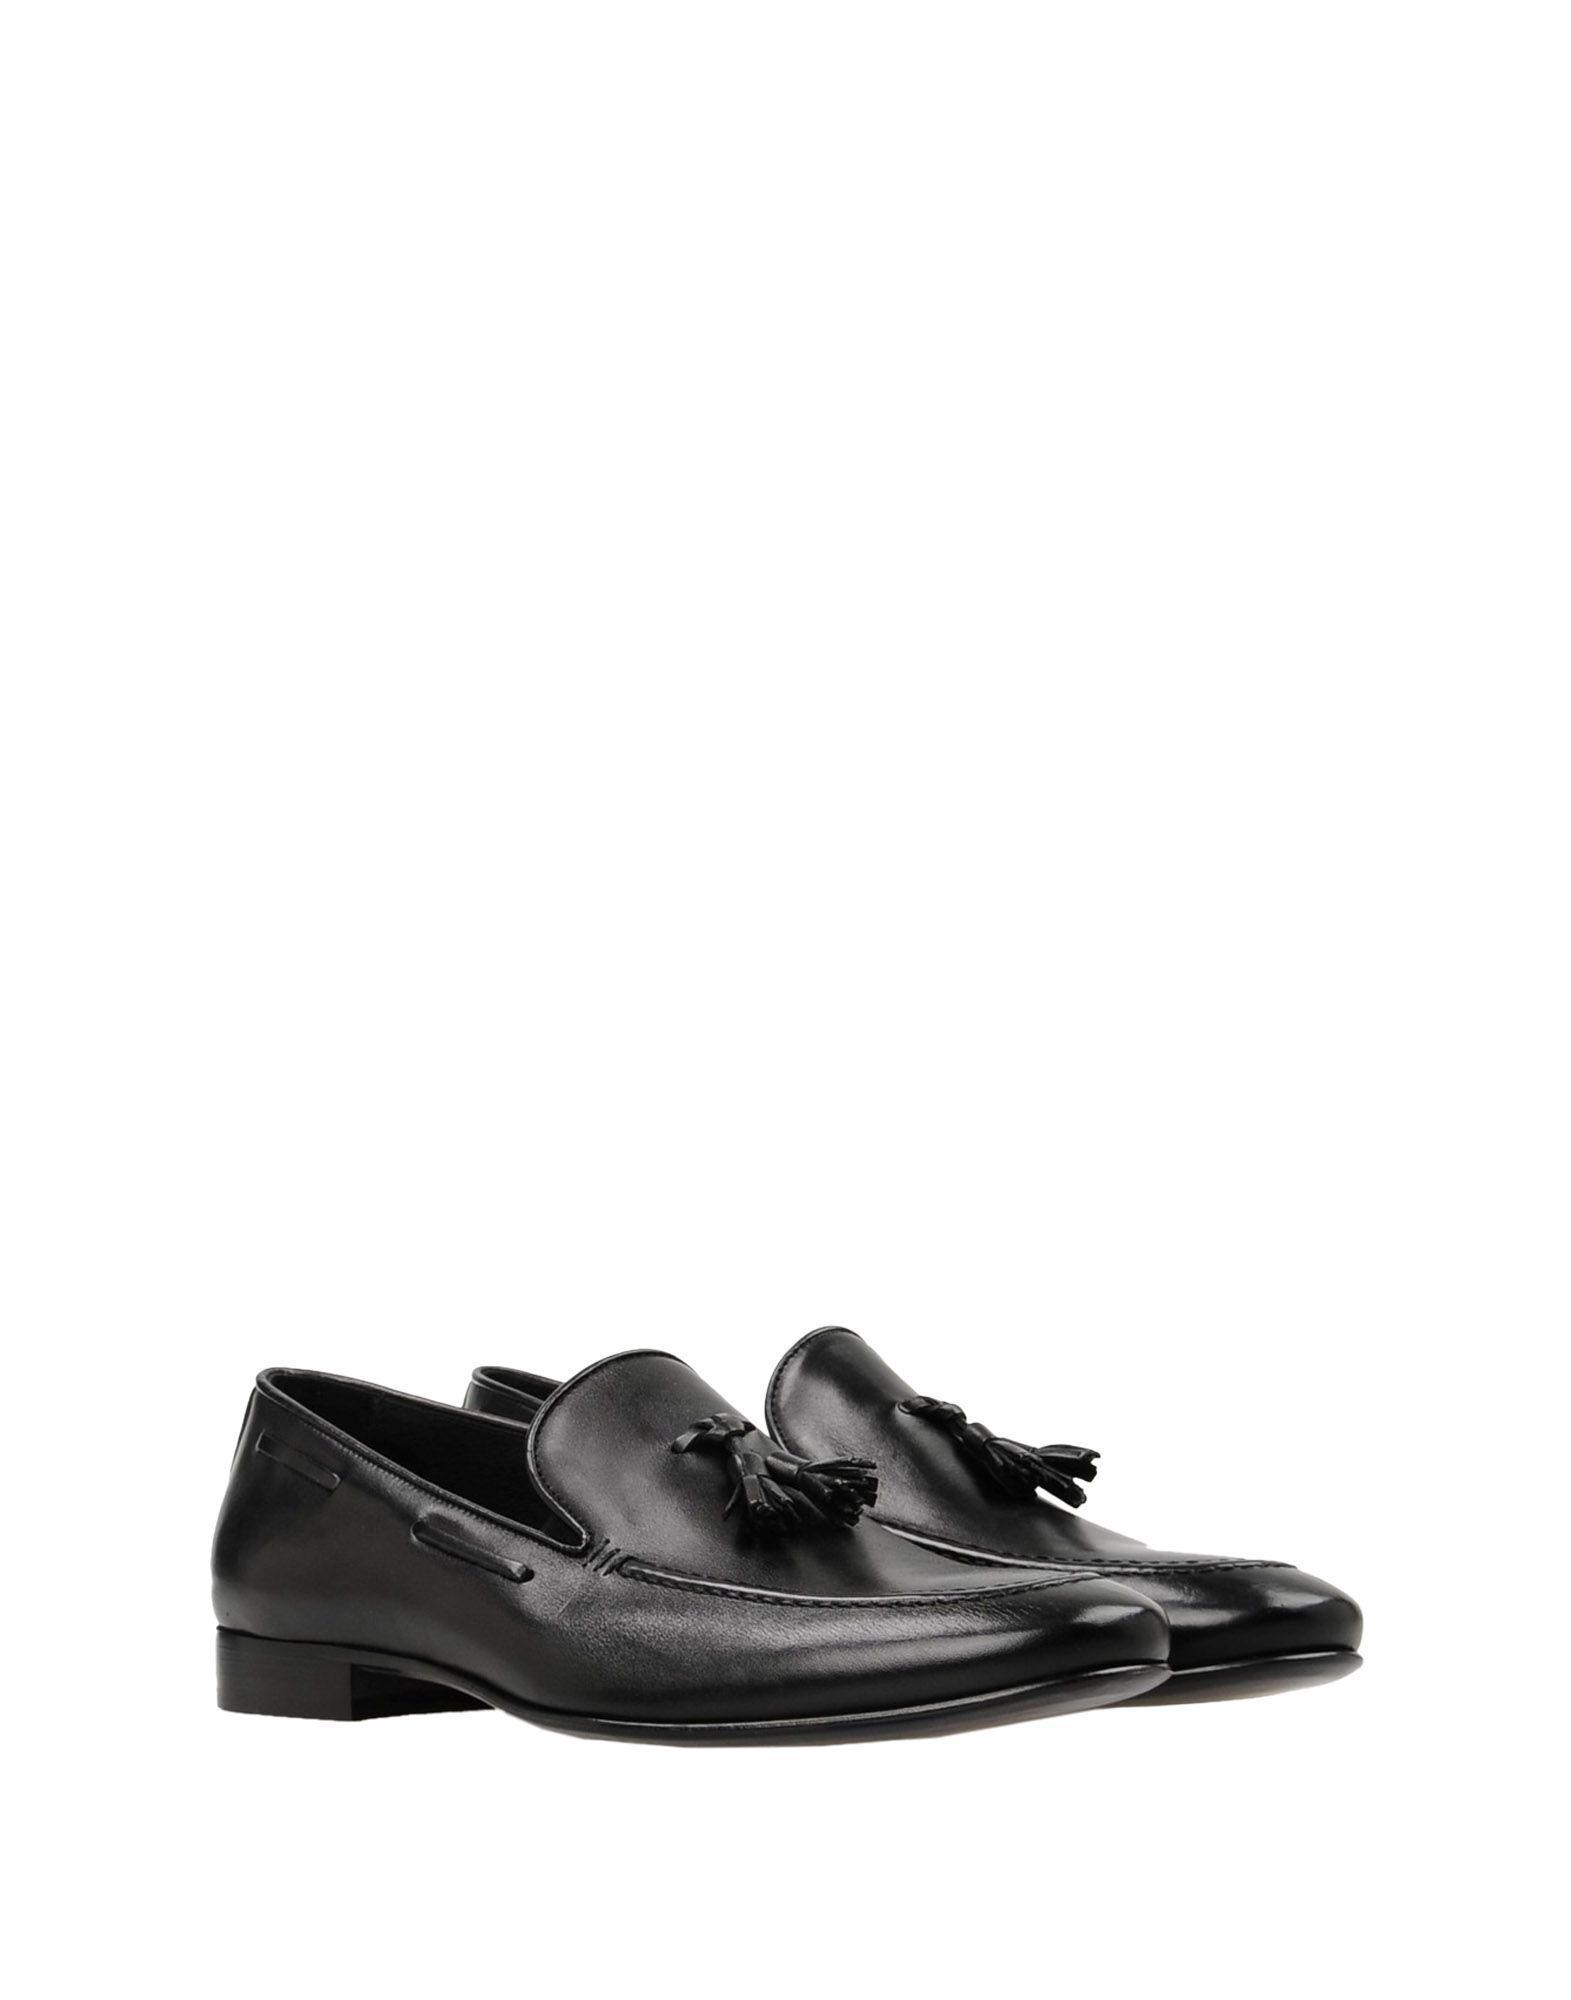 Maldini Leather Loafer in Black for Men